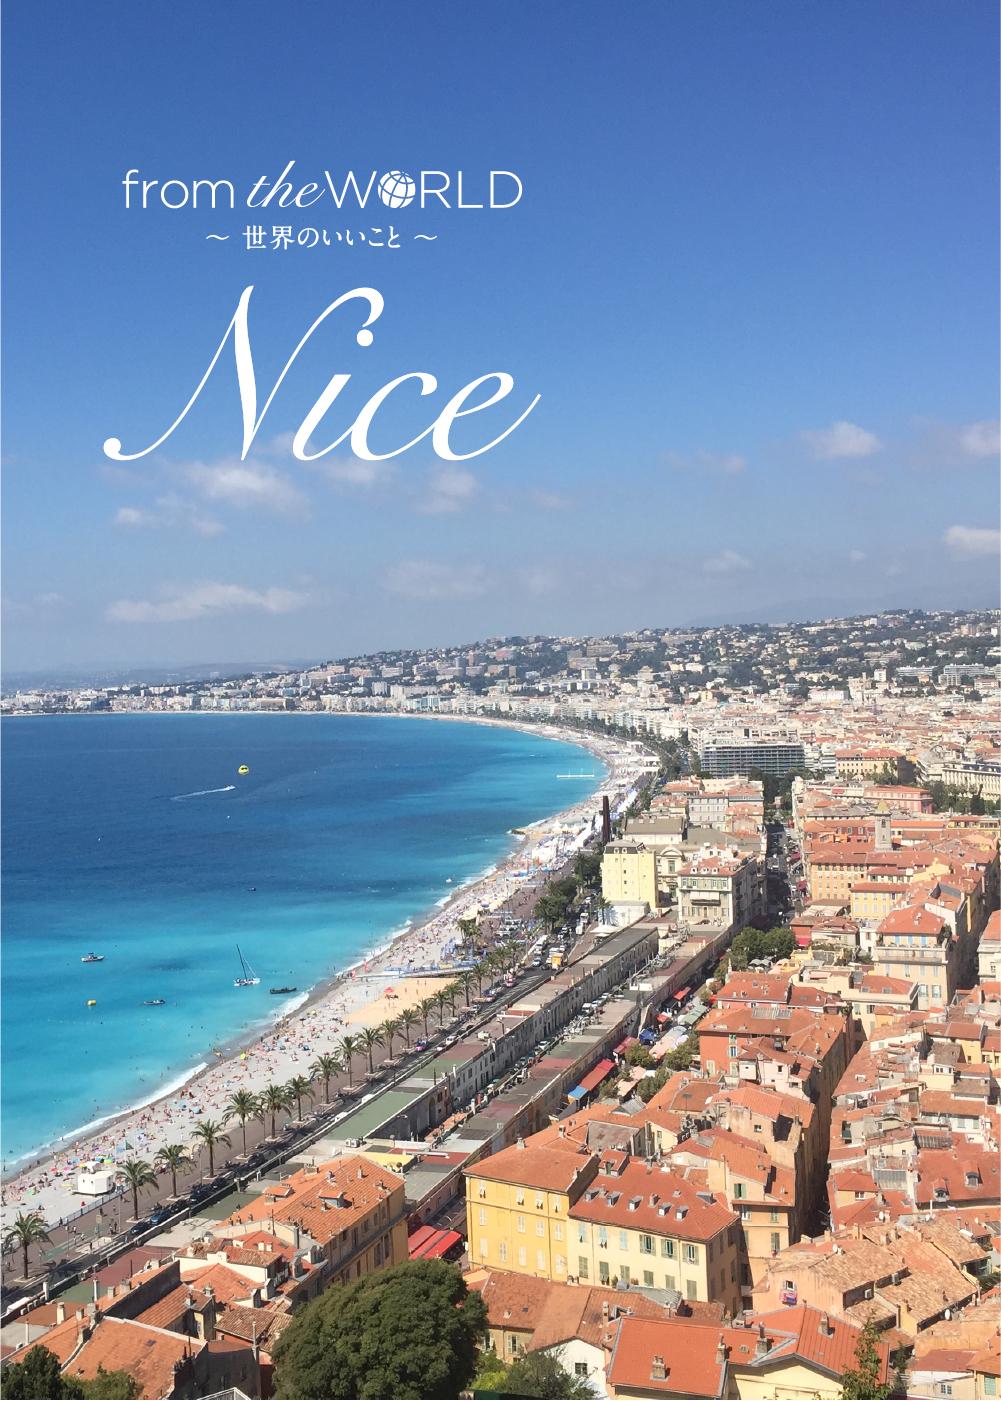 [from Nice]バカンスは心の栄養。フランス人は、サステナブルにバカンスを楽しむ【前編】by Wakana Kawahito